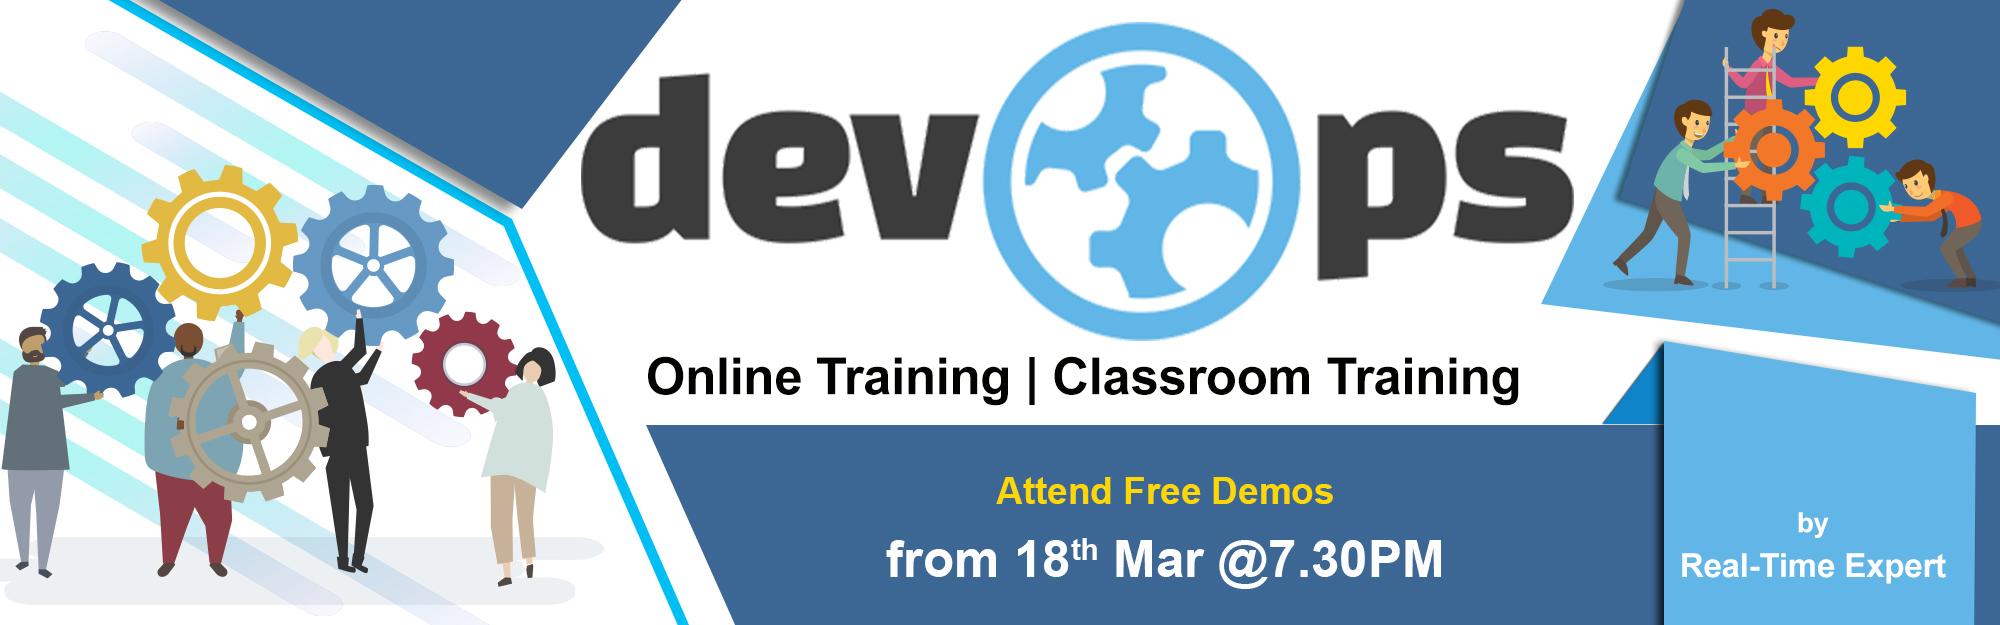 Devops-Training-in-Hyderabad